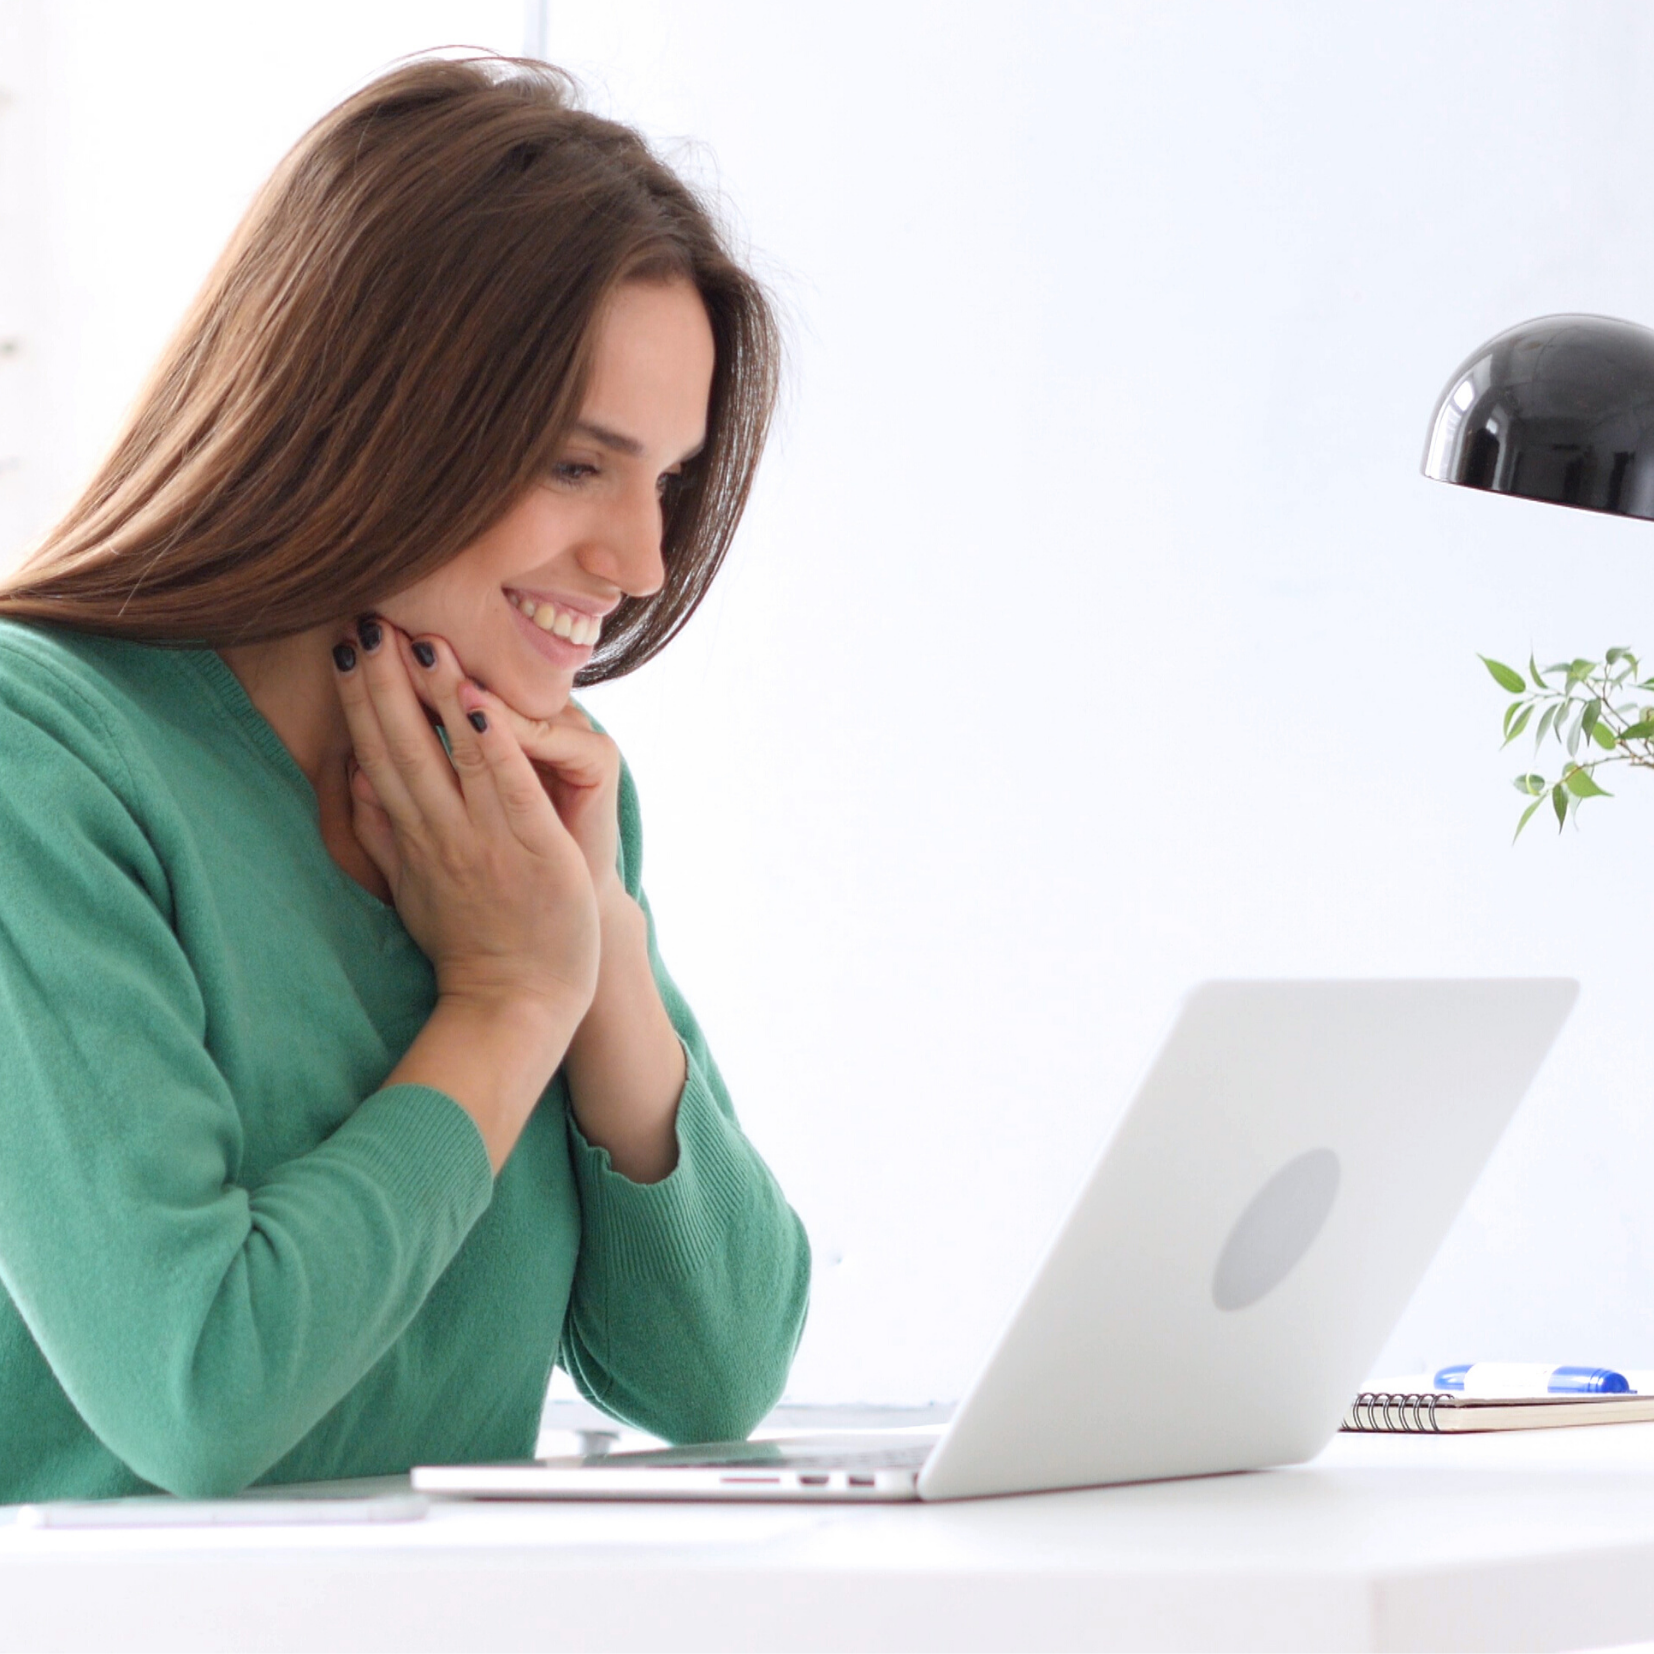 Wellbeing & Stress Management